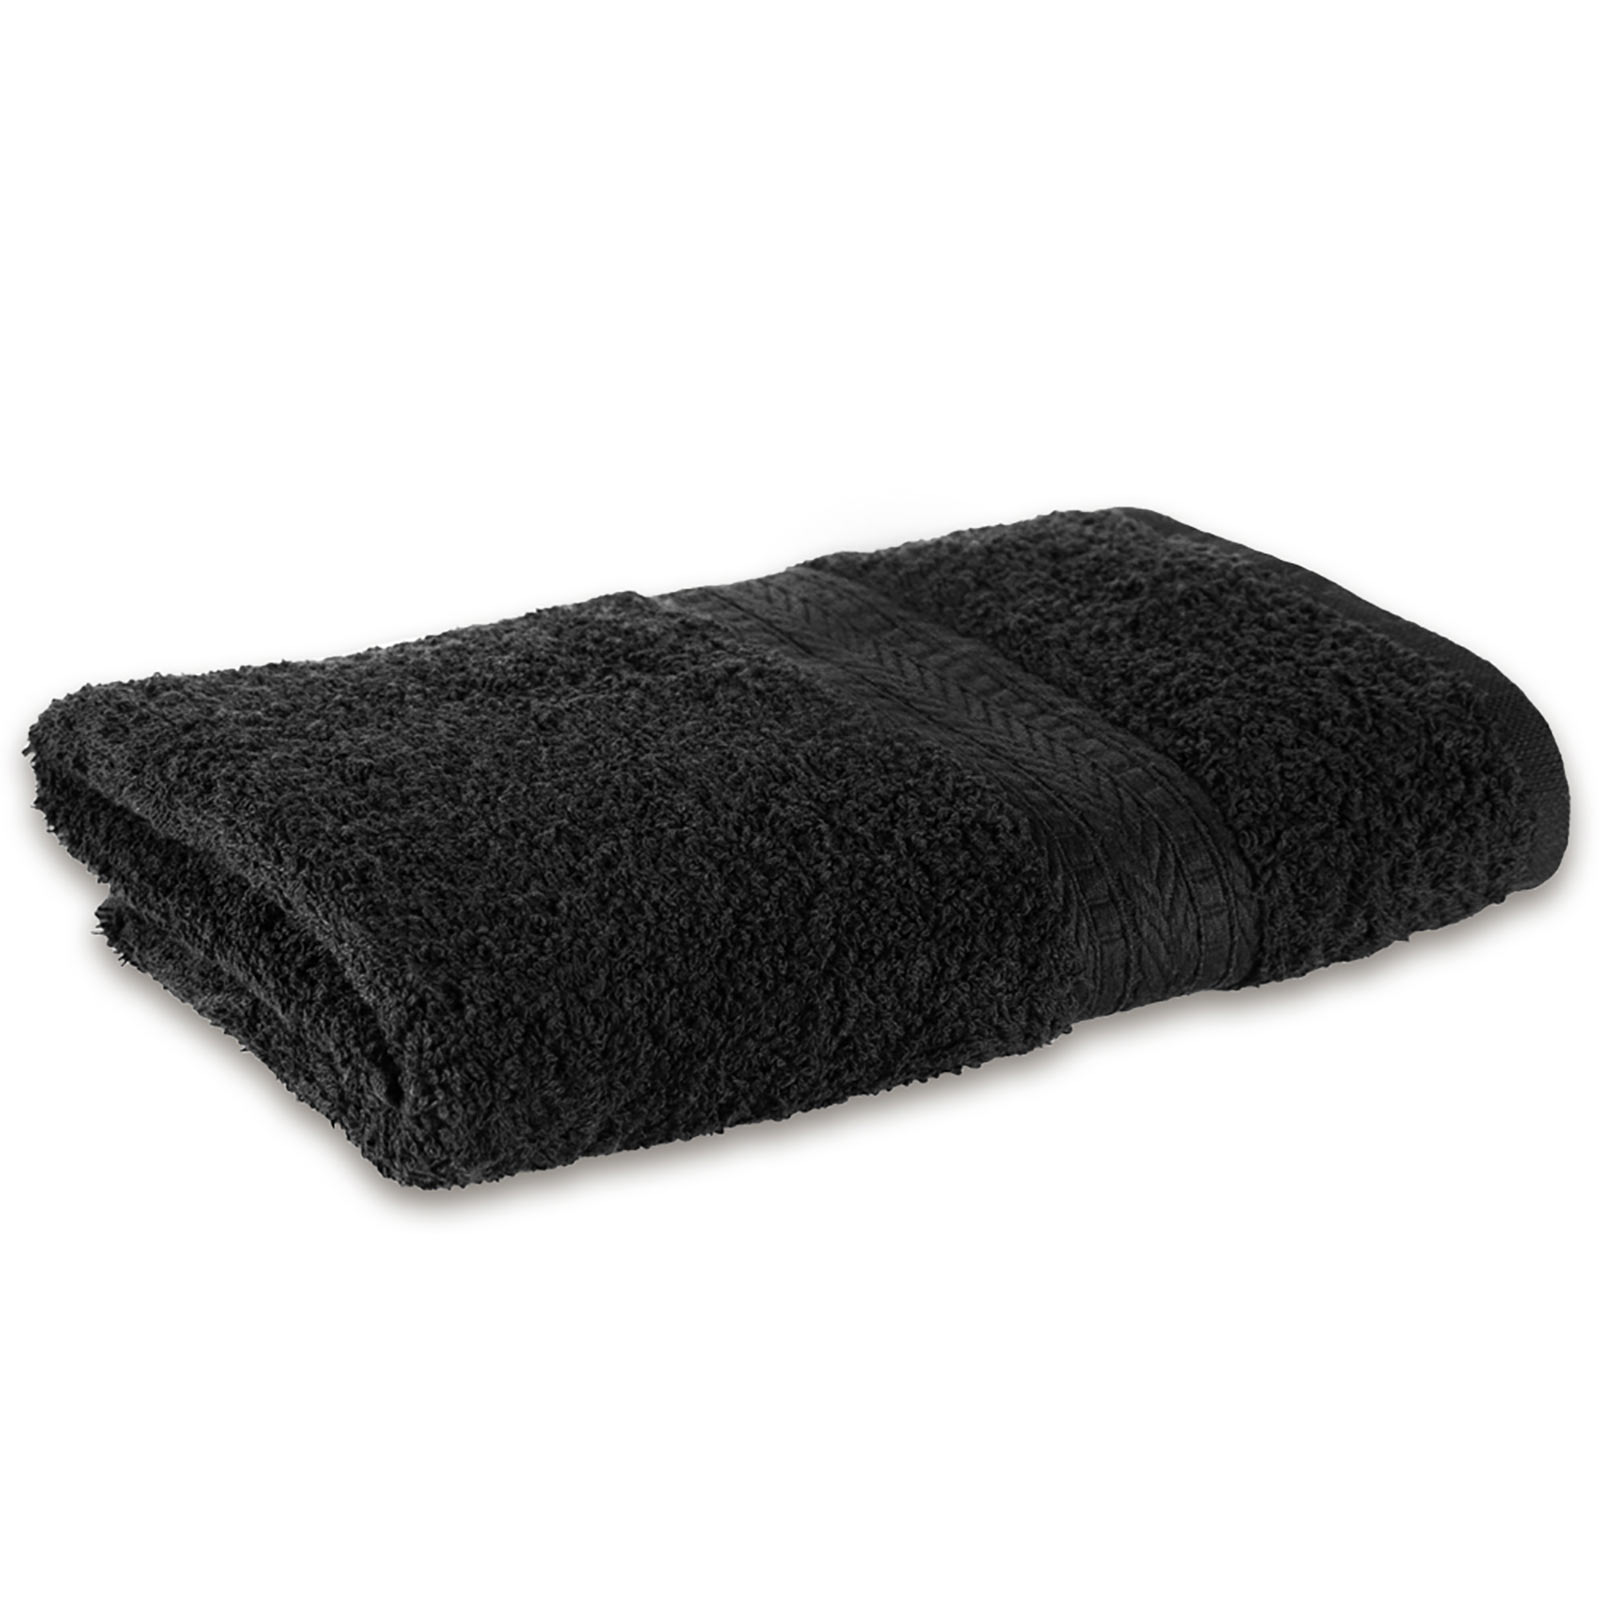 6 handt cher schwarzes handtuch black schwarz friseur ebay. Black Bedroom Furniture Sets. Home Design Ideas